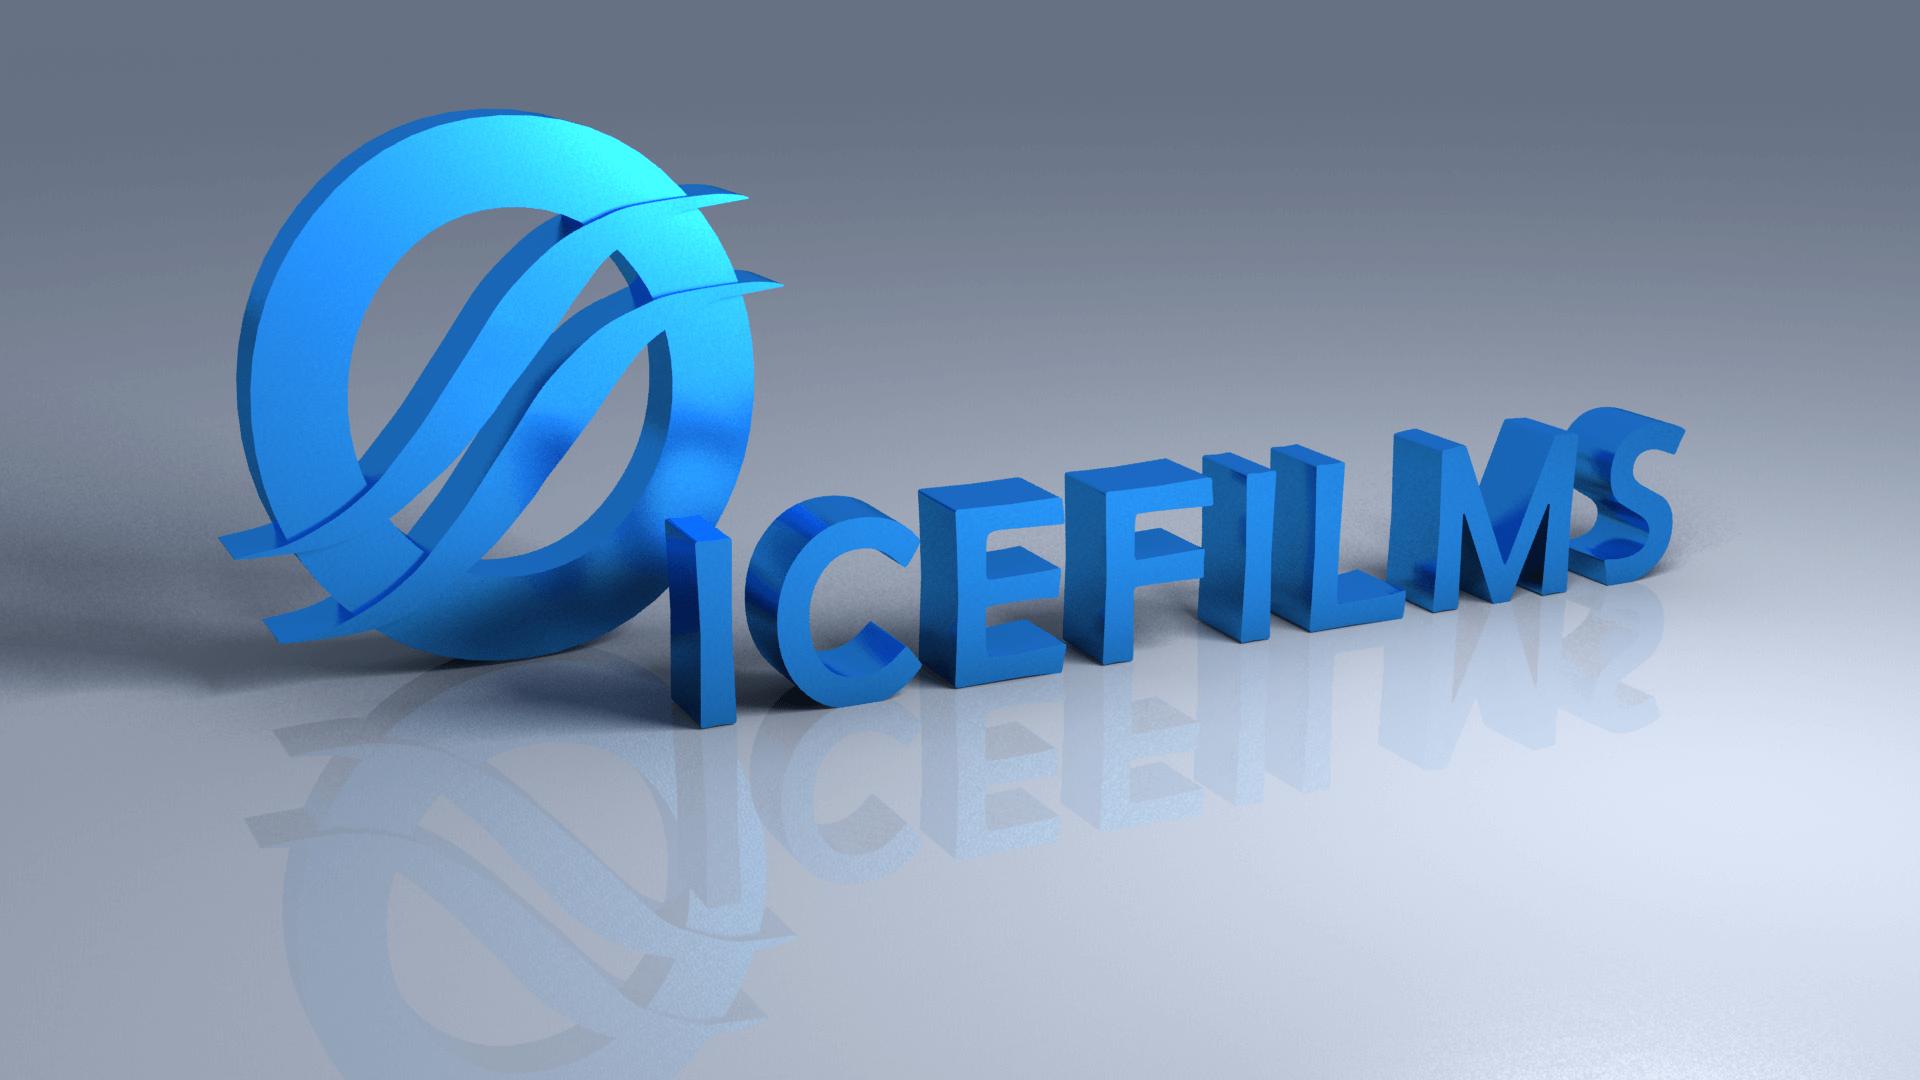 Icefilms kodi addon download and install on kodi krypton 17. 3 & 17. 4.